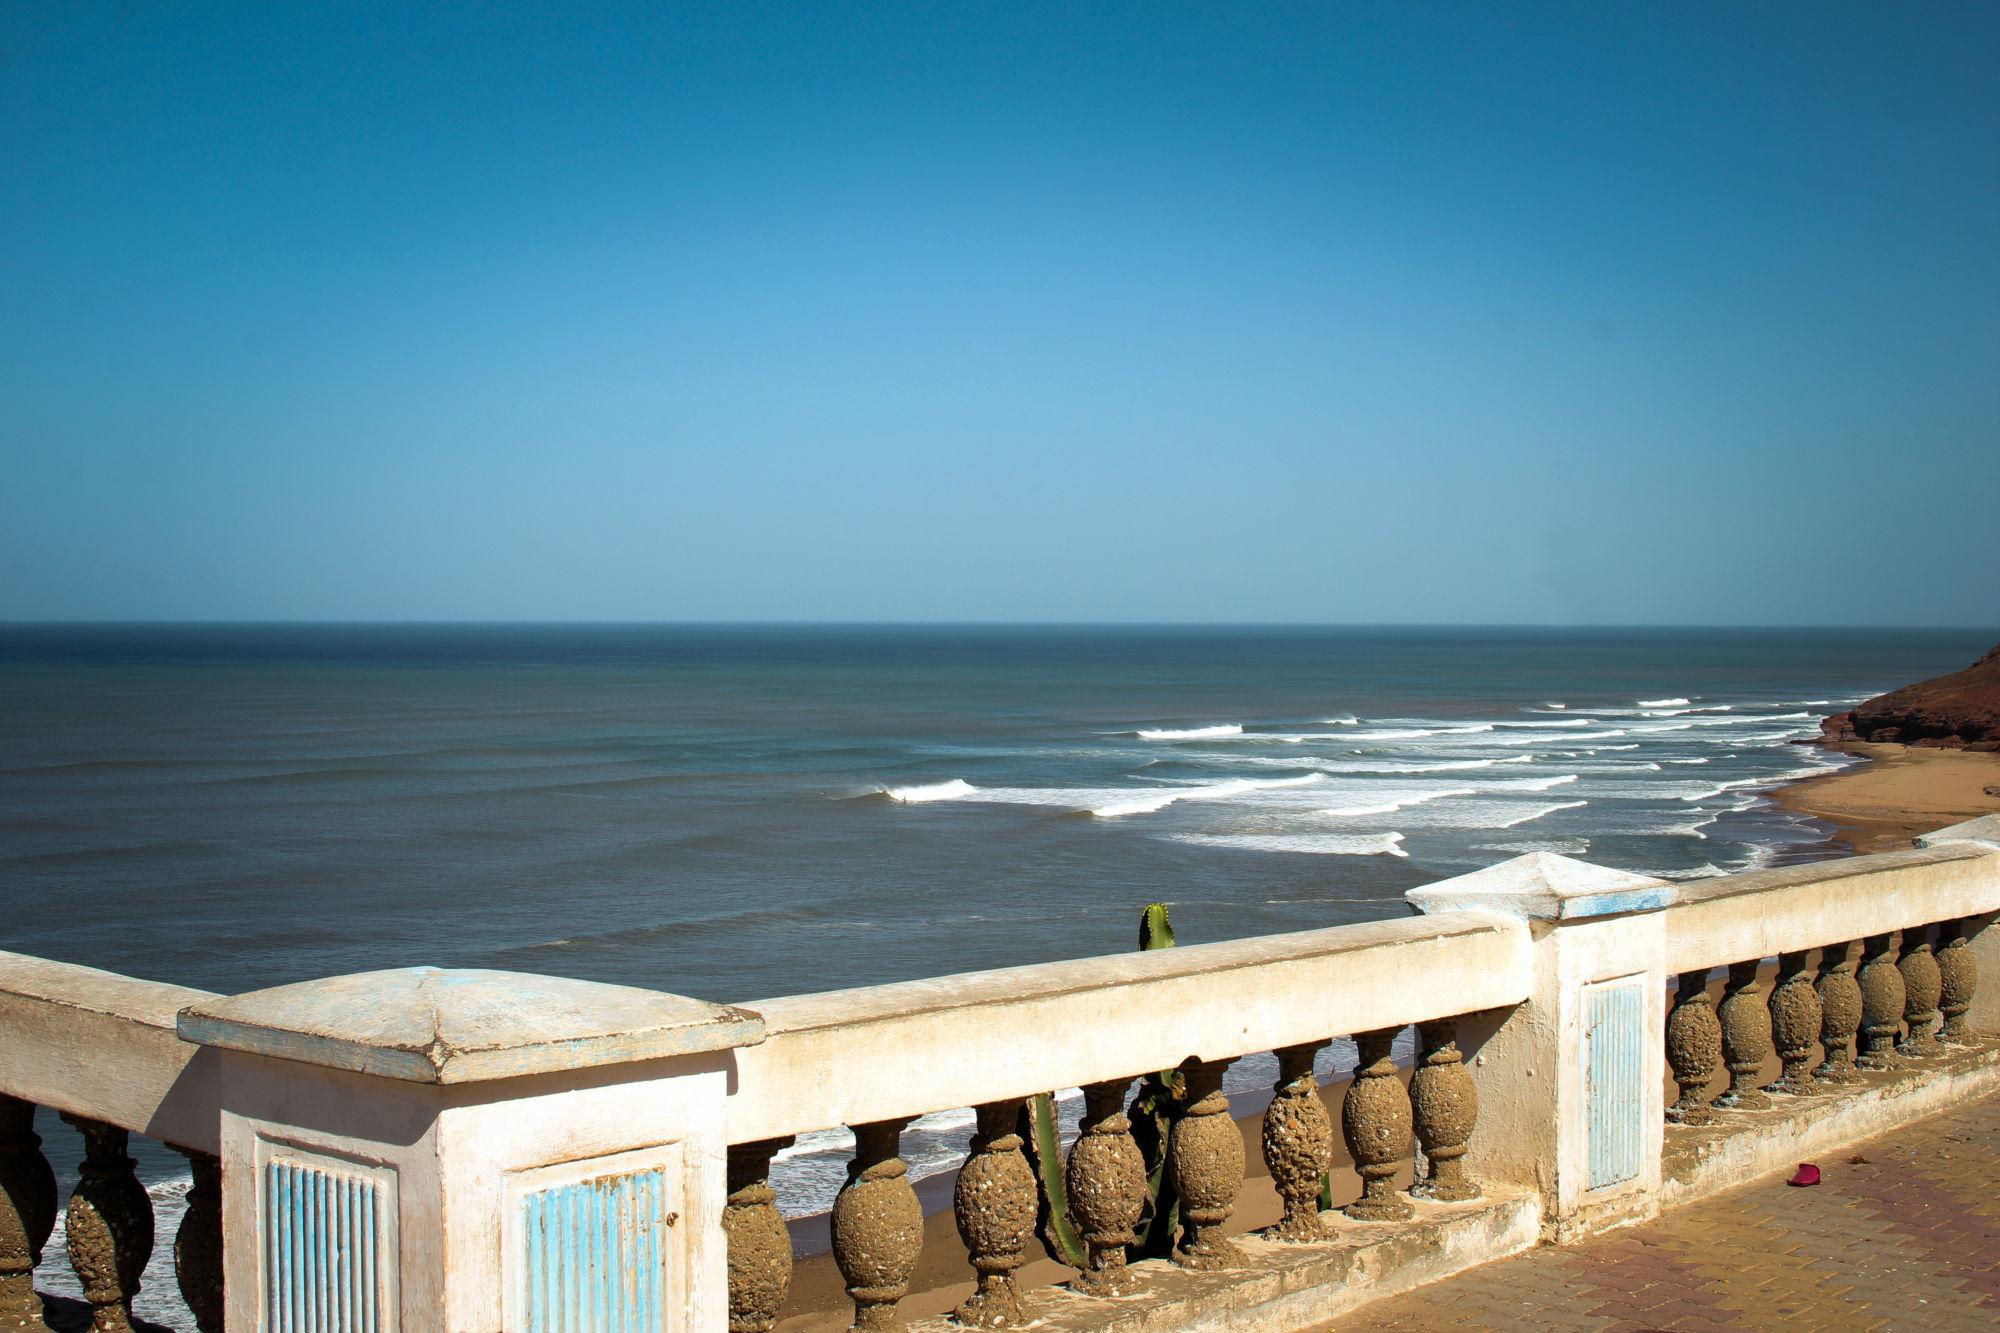 CaminoSurf_Morocco_Pic1_WEB